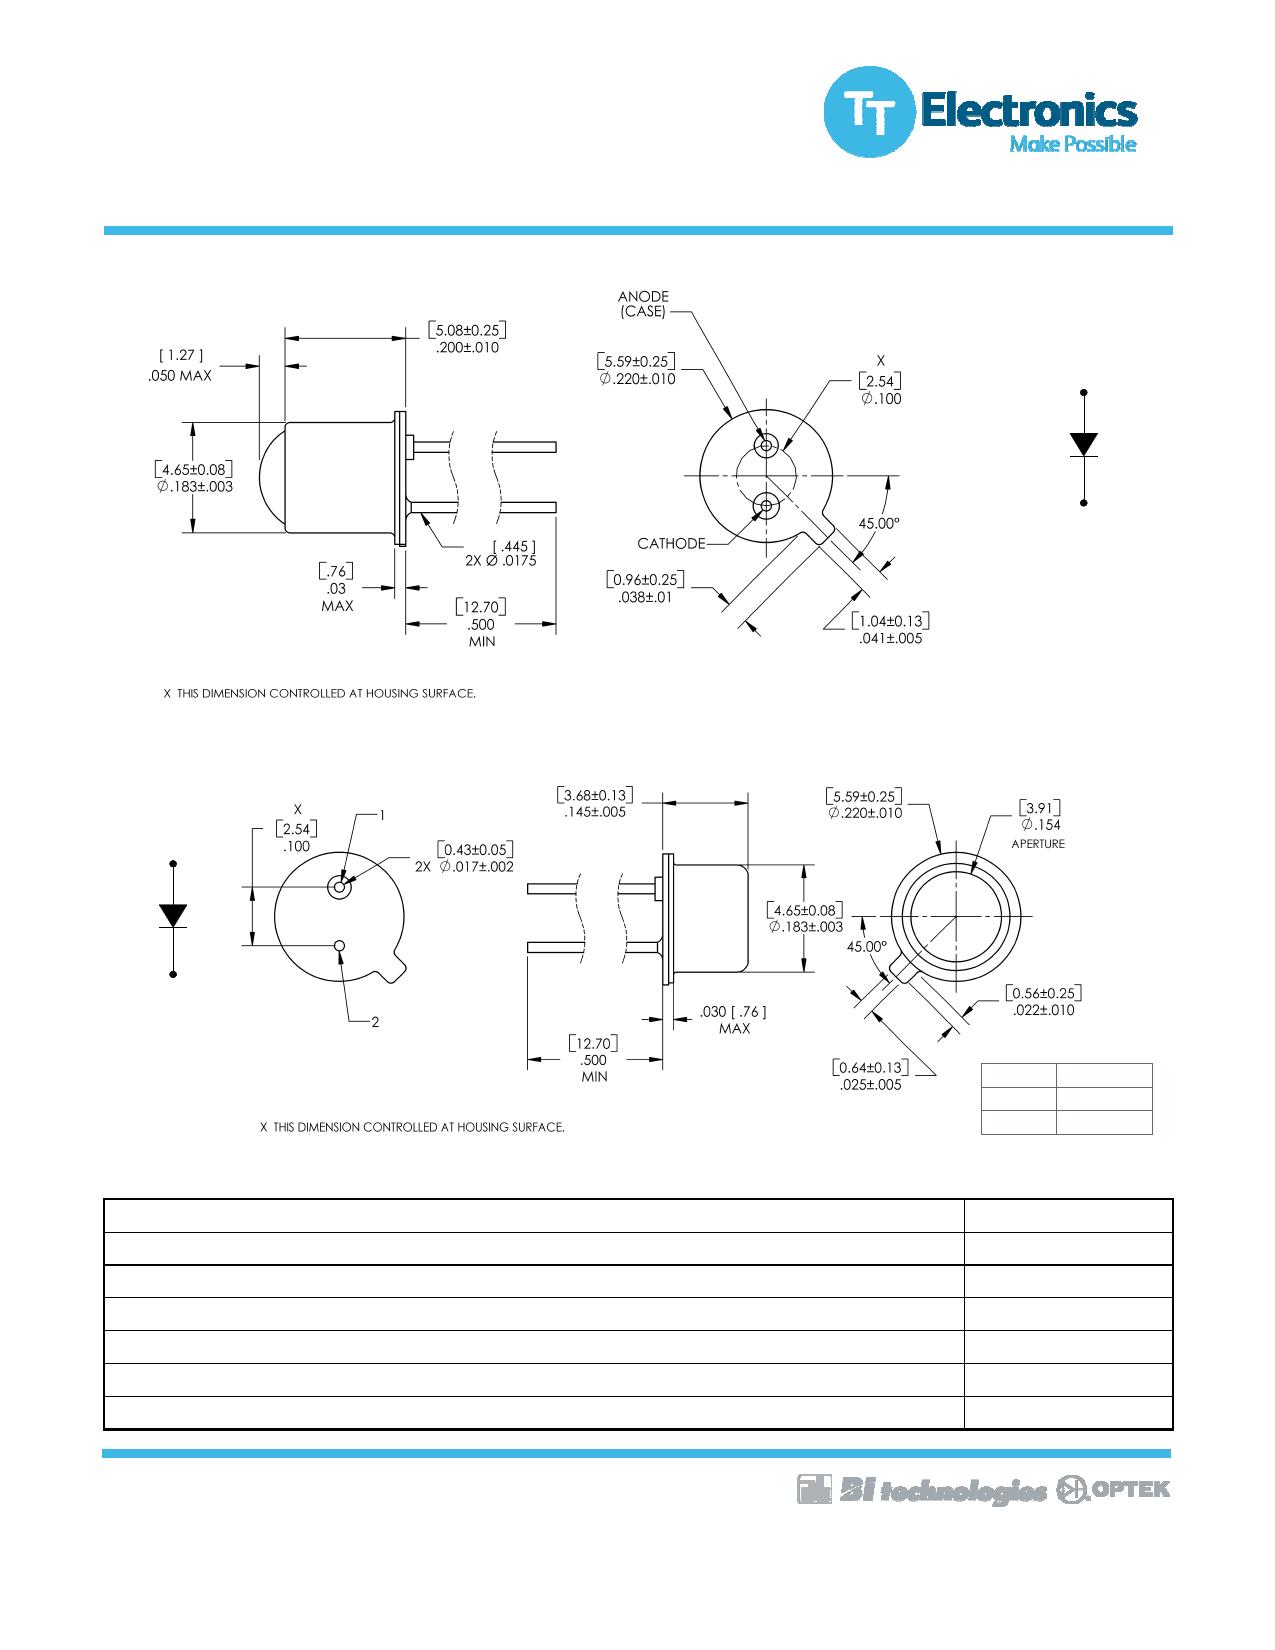 OP232 pdf, schematic